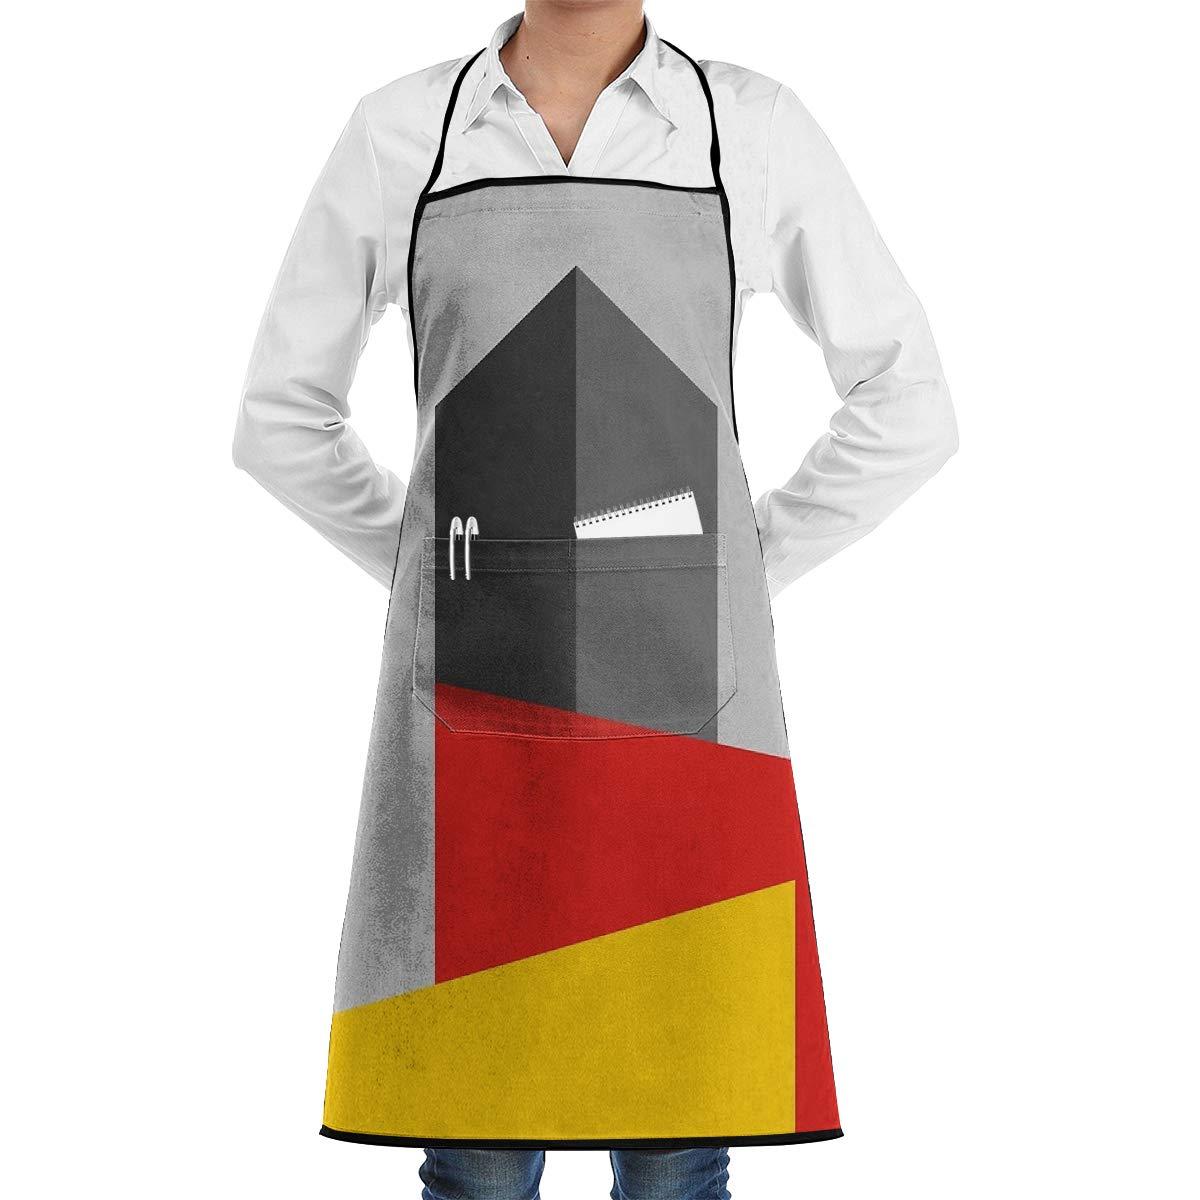 Ameok-Design Bauhaus Tower - Delantal de Cocina Unisex Ajustable ...